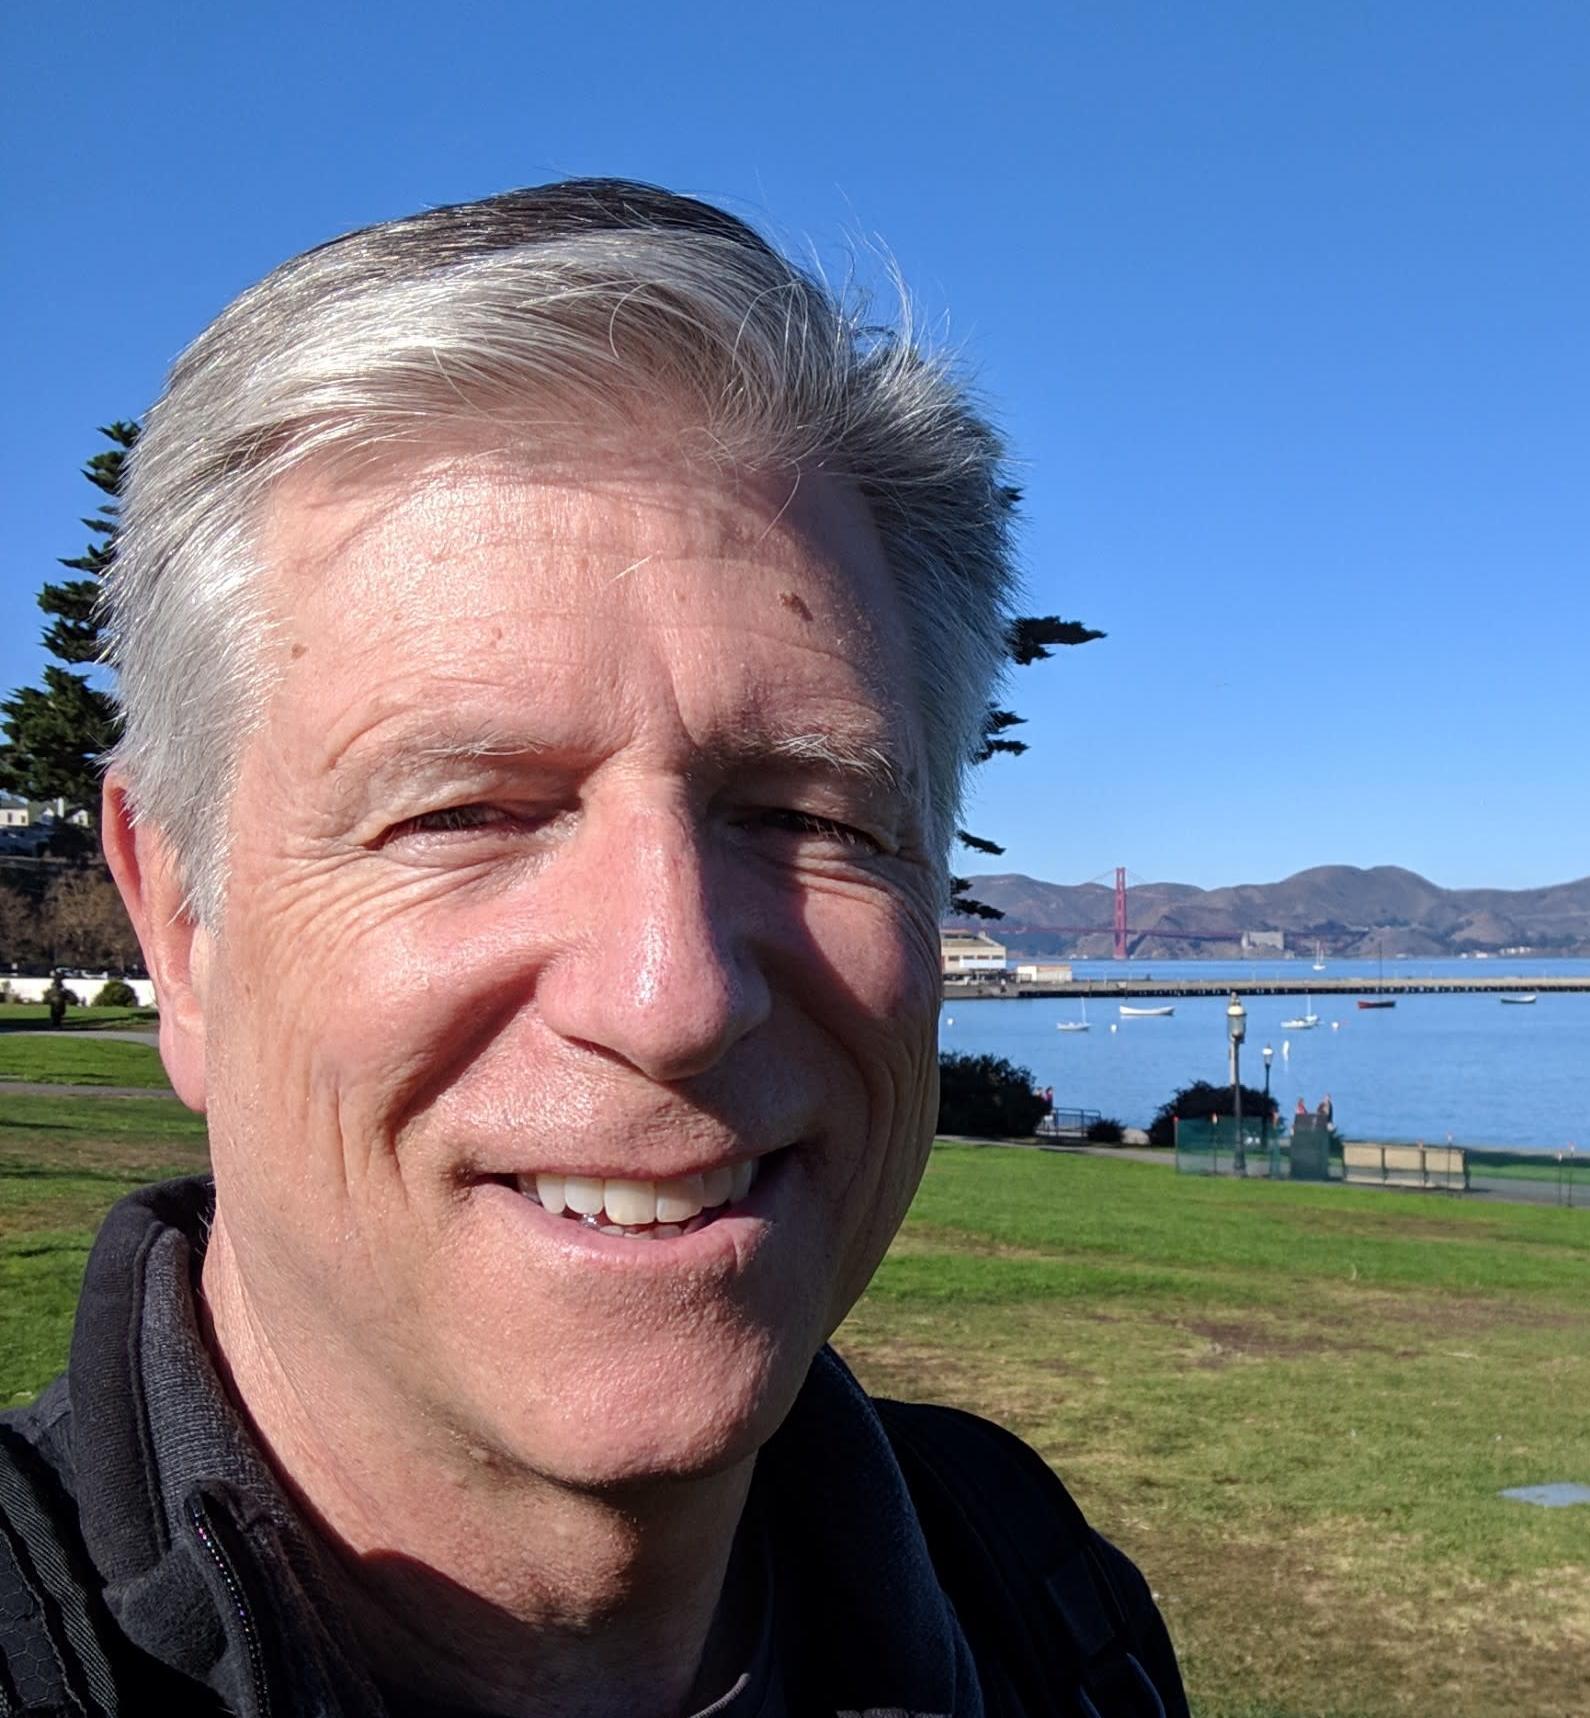 James 'Jim' Miller, MegaMicroFlo.com